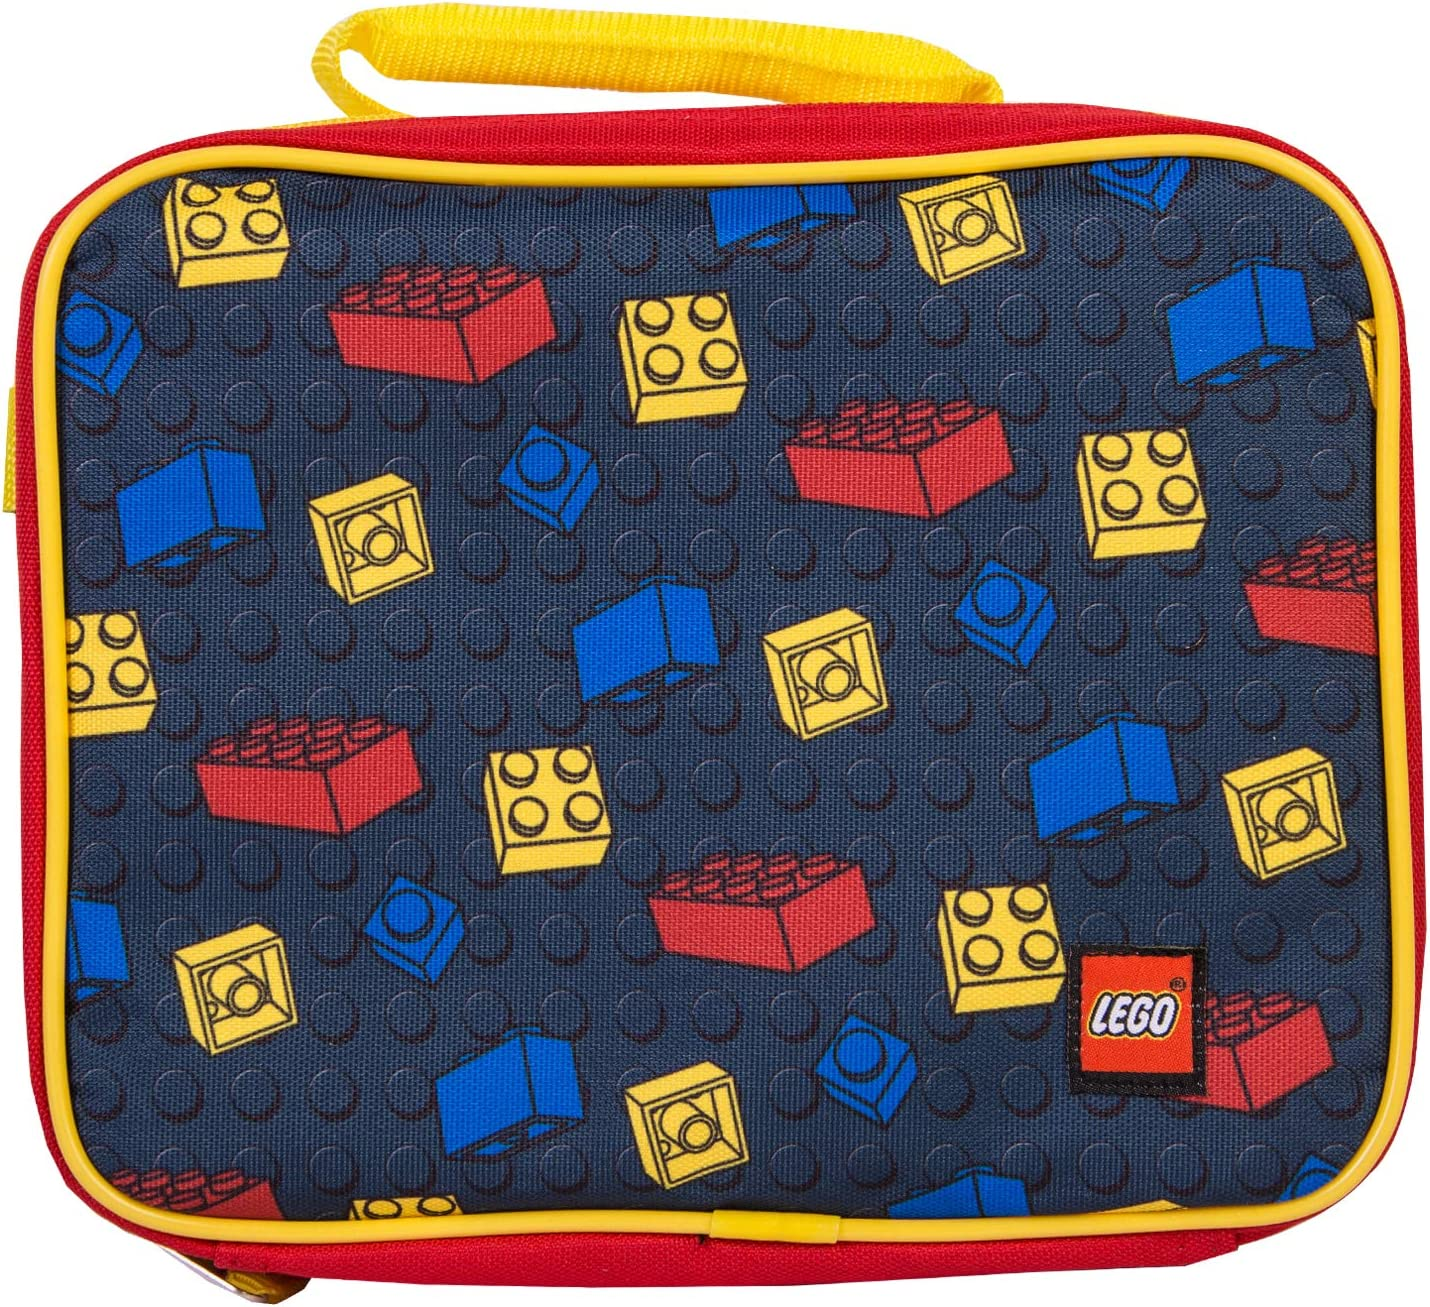 LEGO Batman Backpack Combo Set - Lego Boys\' 4 Piece Backpack Set - Backpack & Lunch Kit